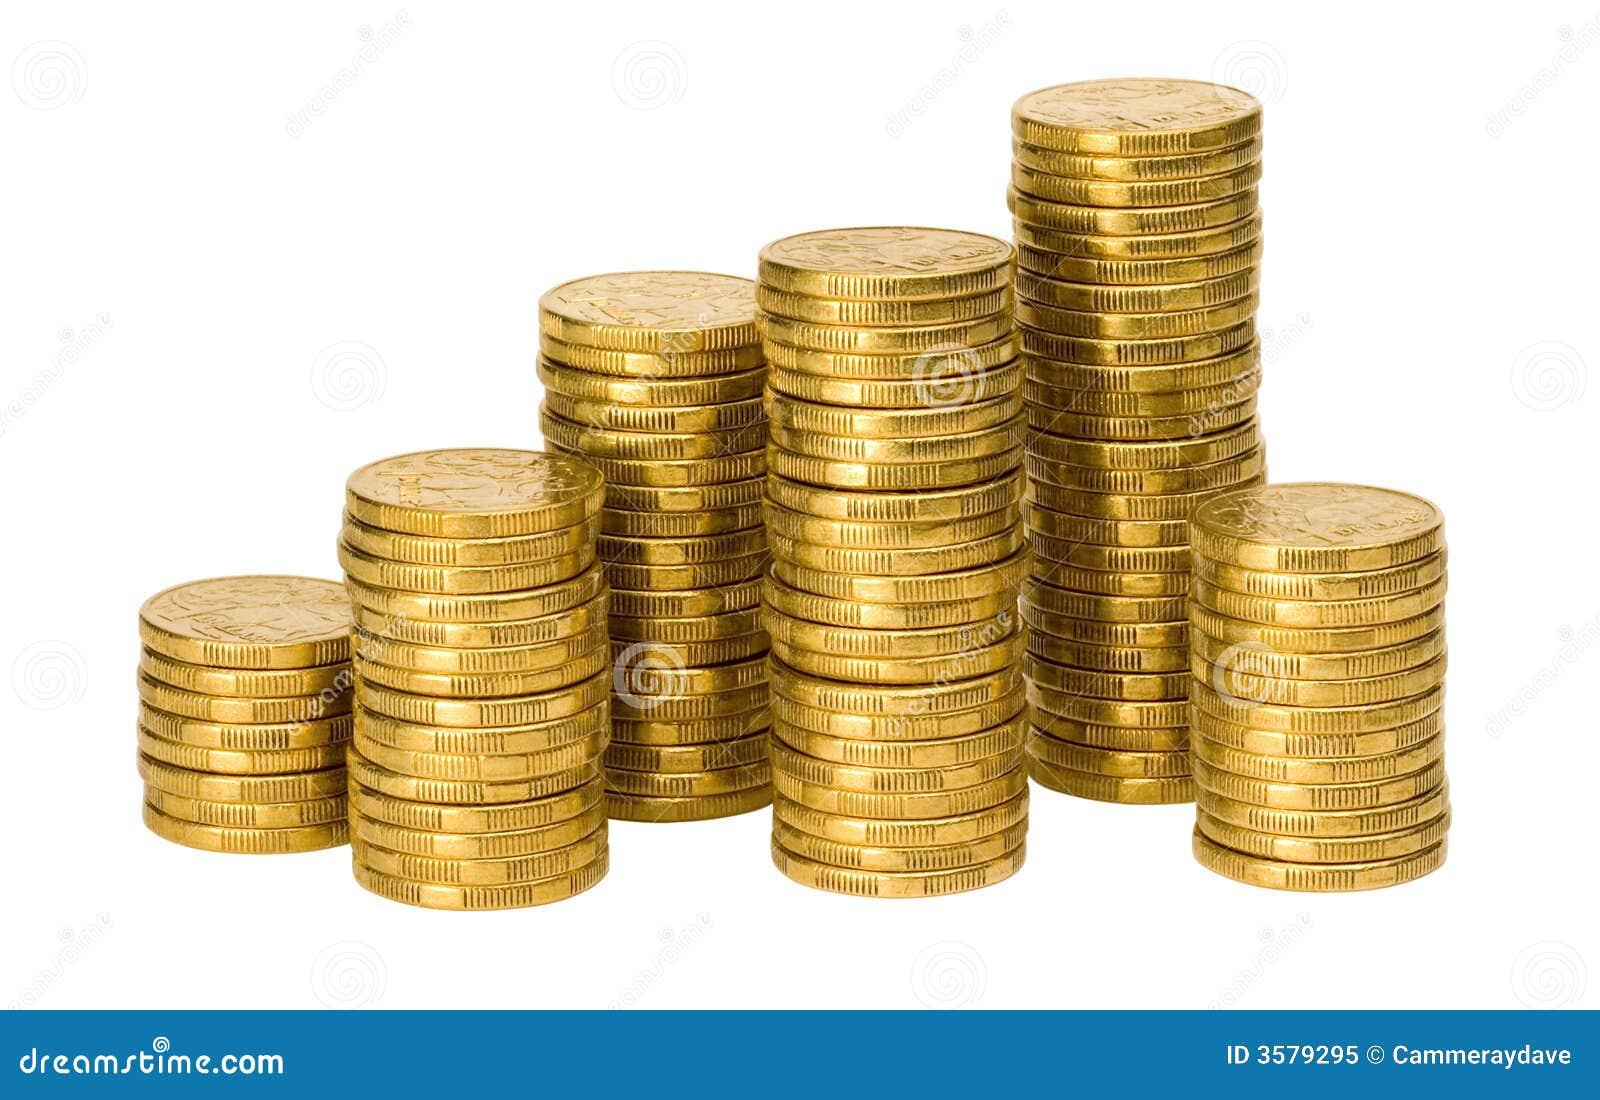 Australier coins pengarbuntar